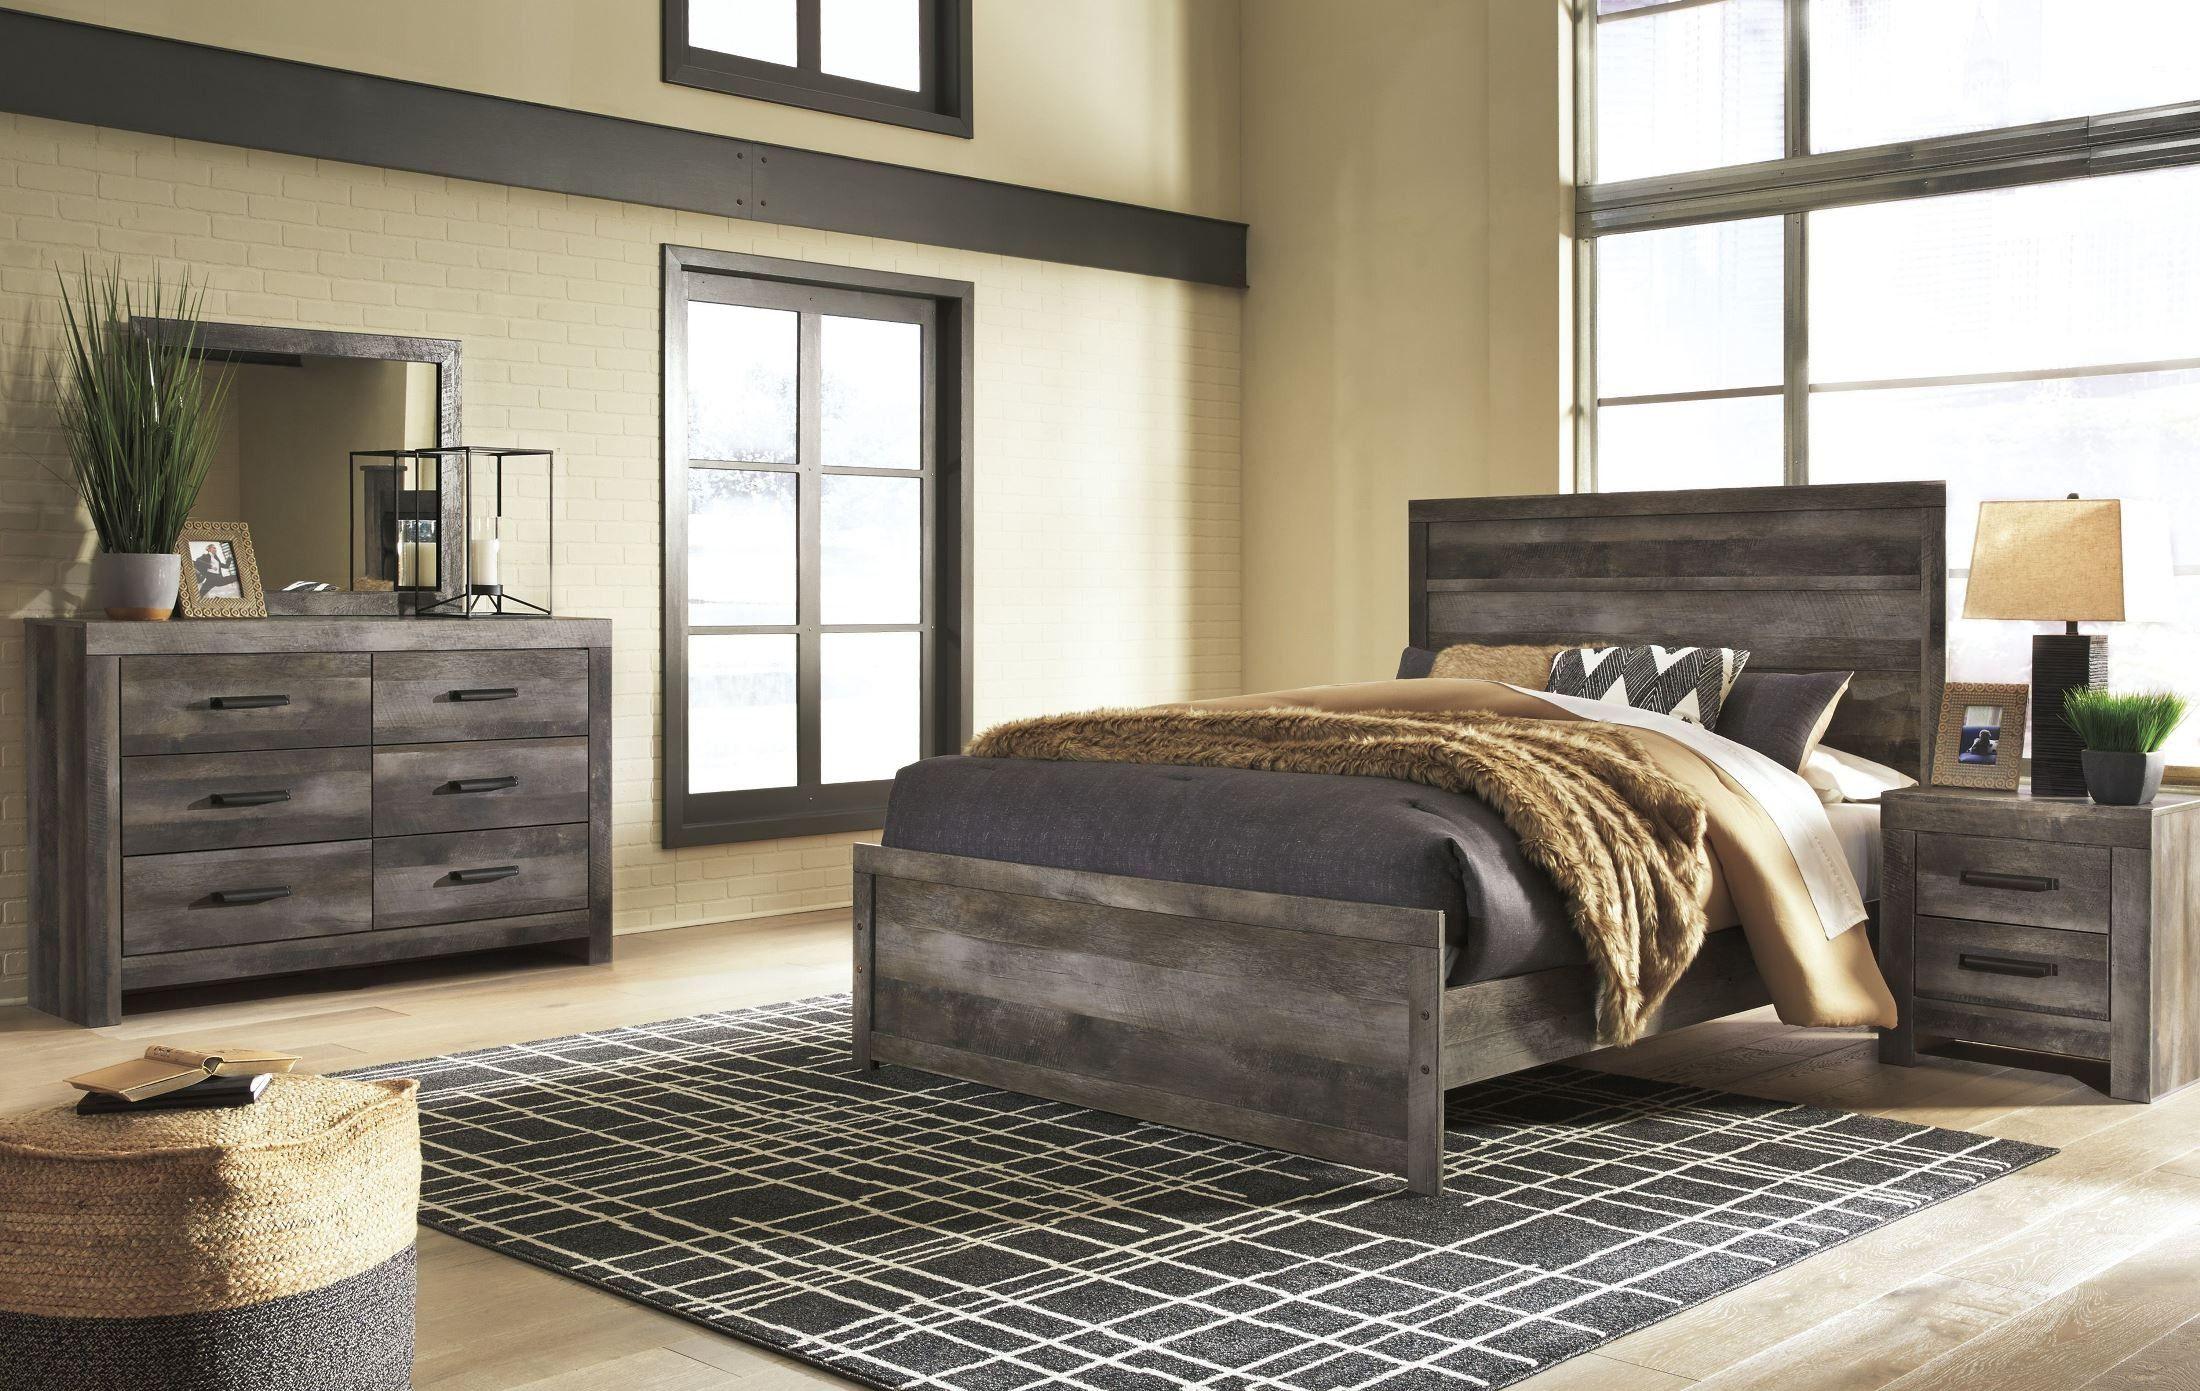 Wynnlow Brown Panel Bedroom Set in 2019 Panel bed